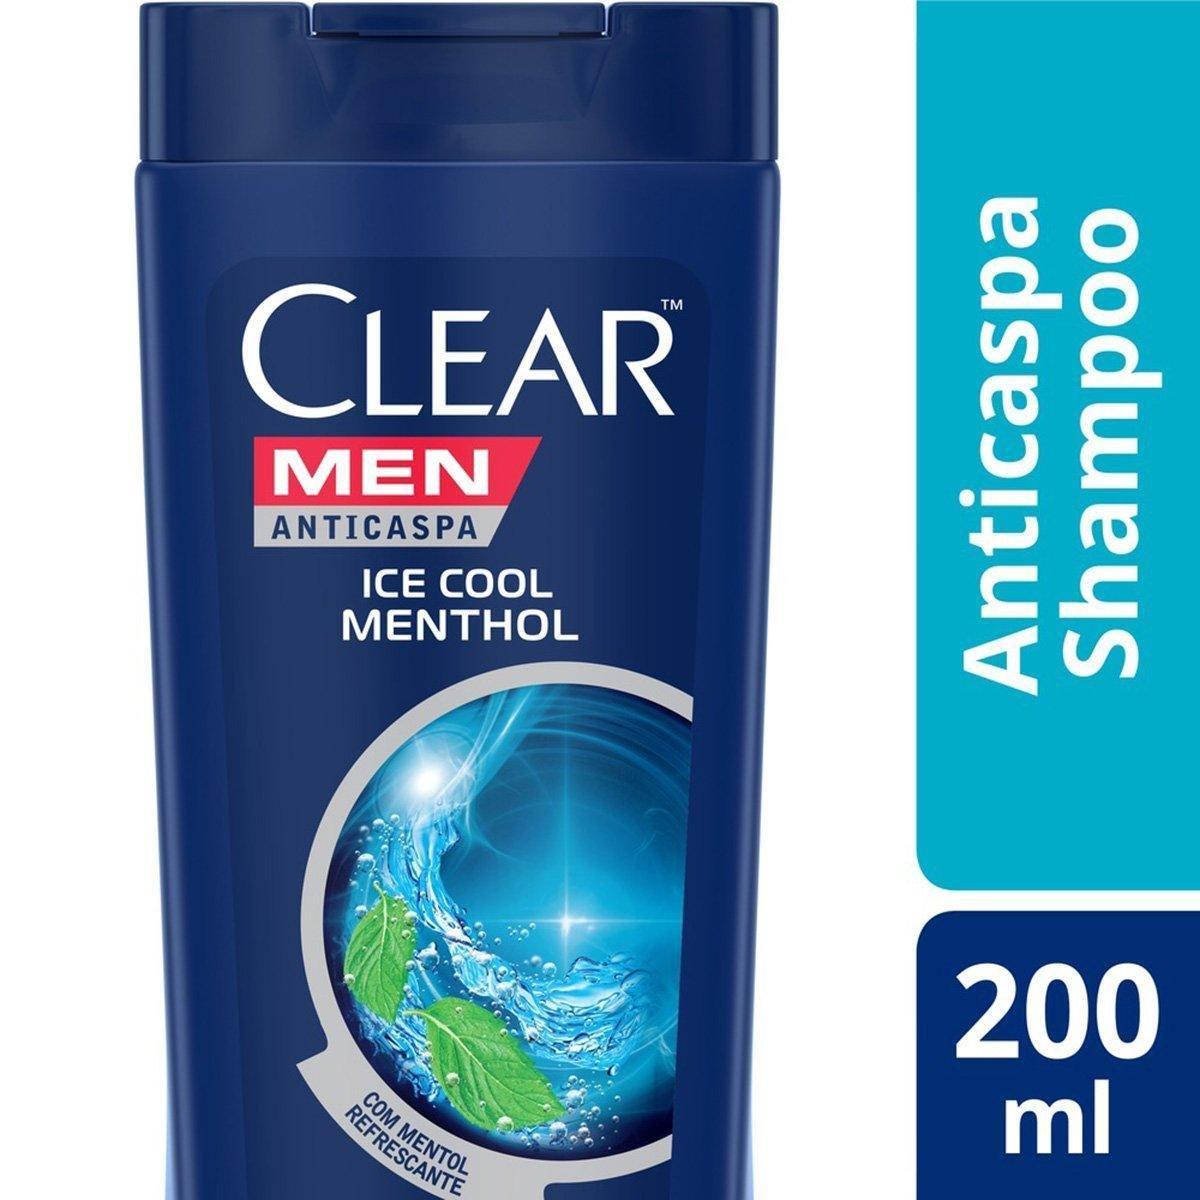 Shampo Clear Ice Cool Menthol Anticaspa 200ml